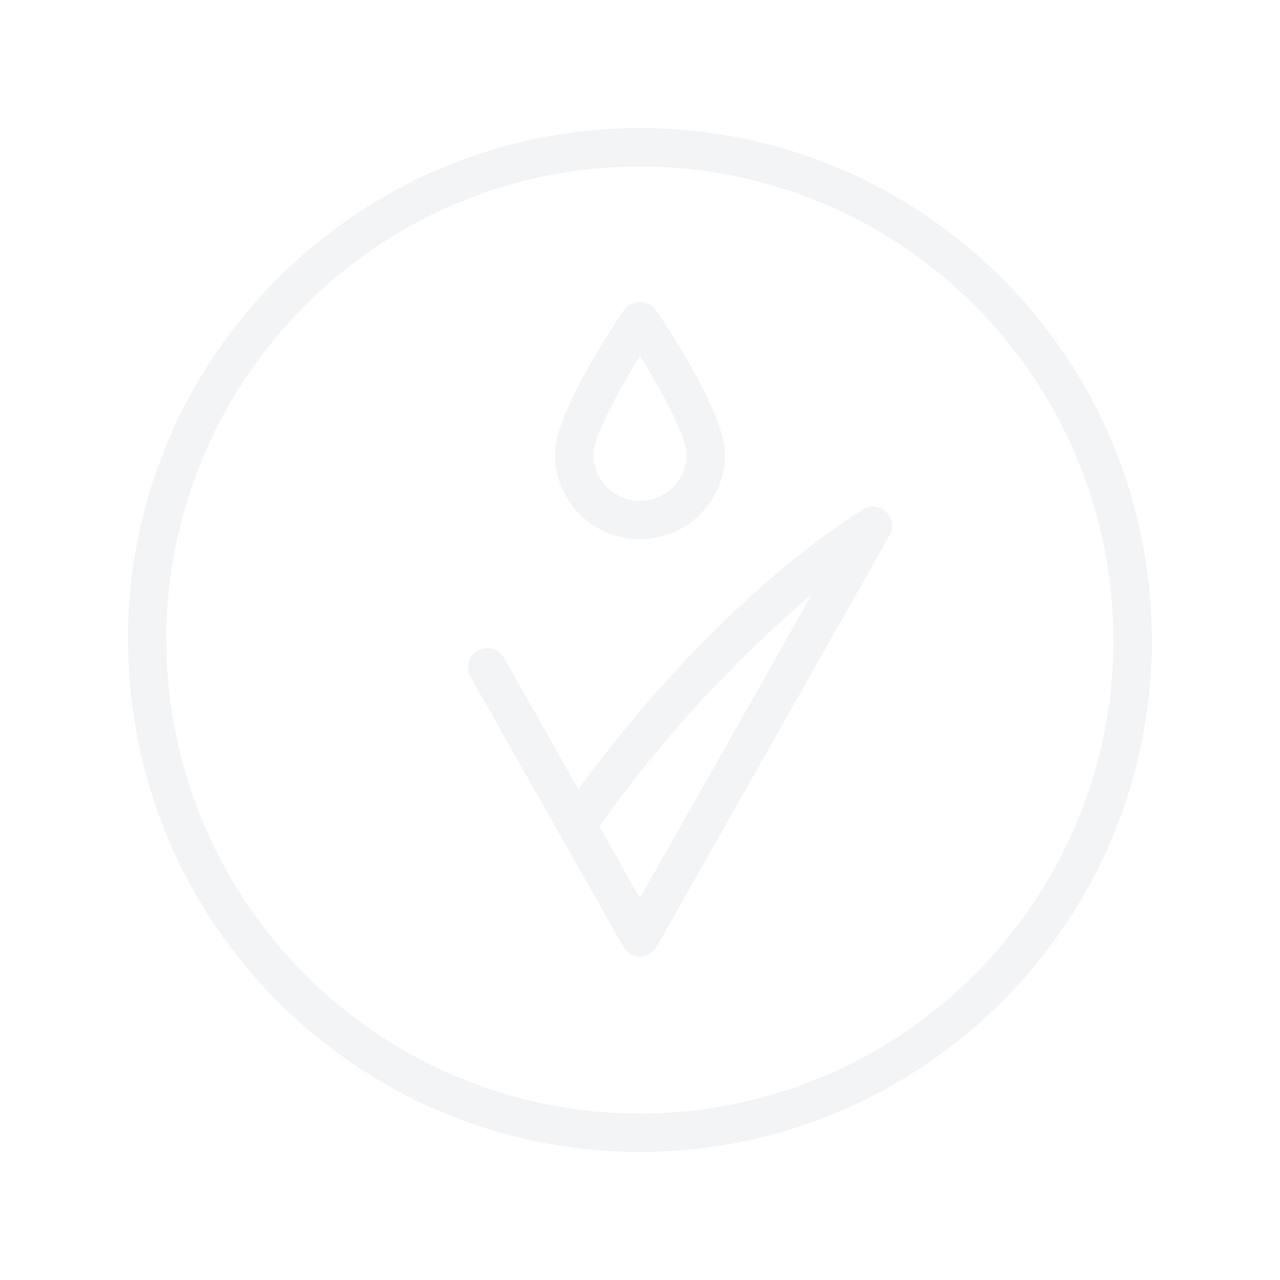 KOCOSTAR Camouflage Outdoor Eye Mask 3g